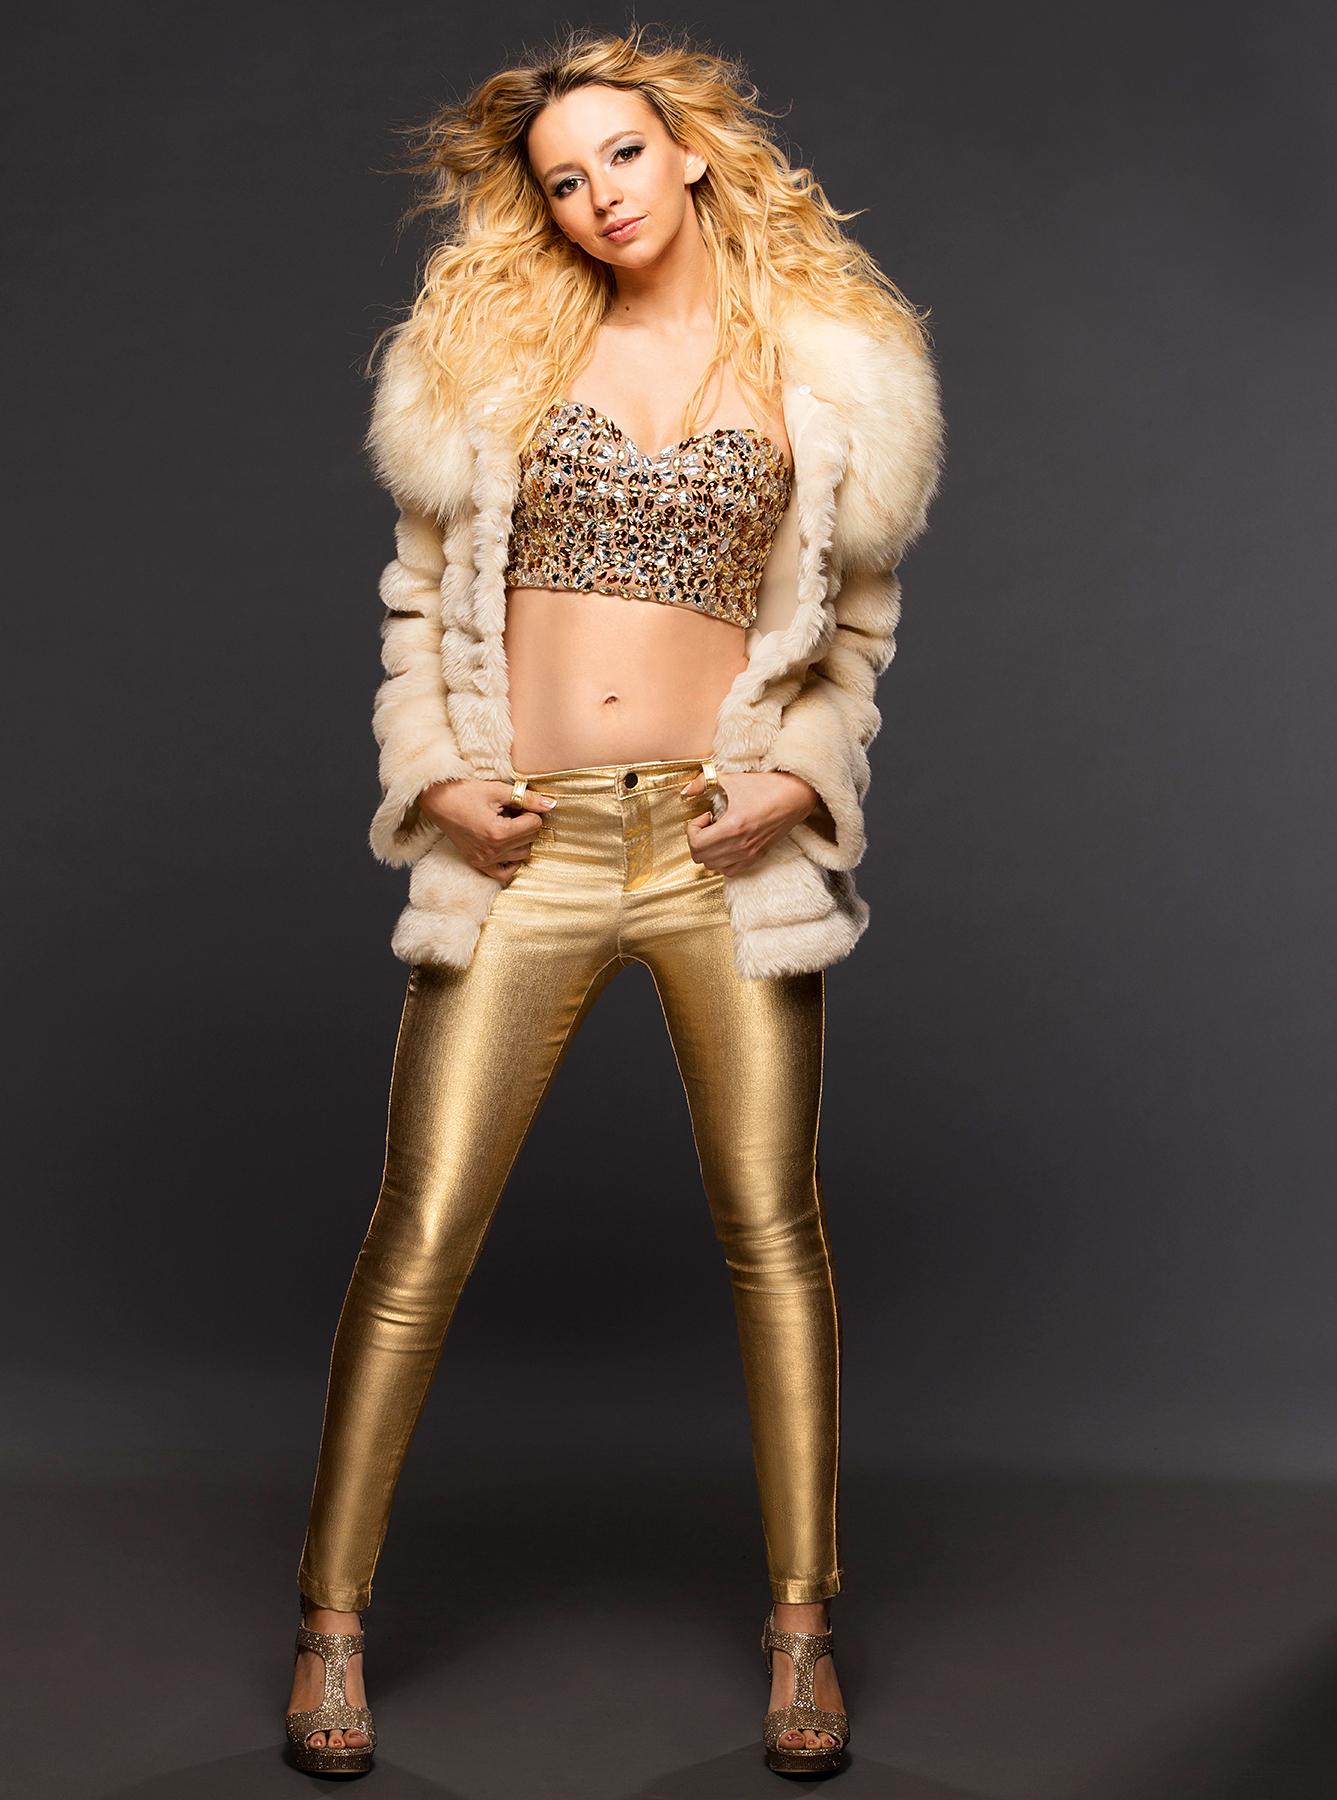 Natasha Bassett Britney Spears Britney Ever After